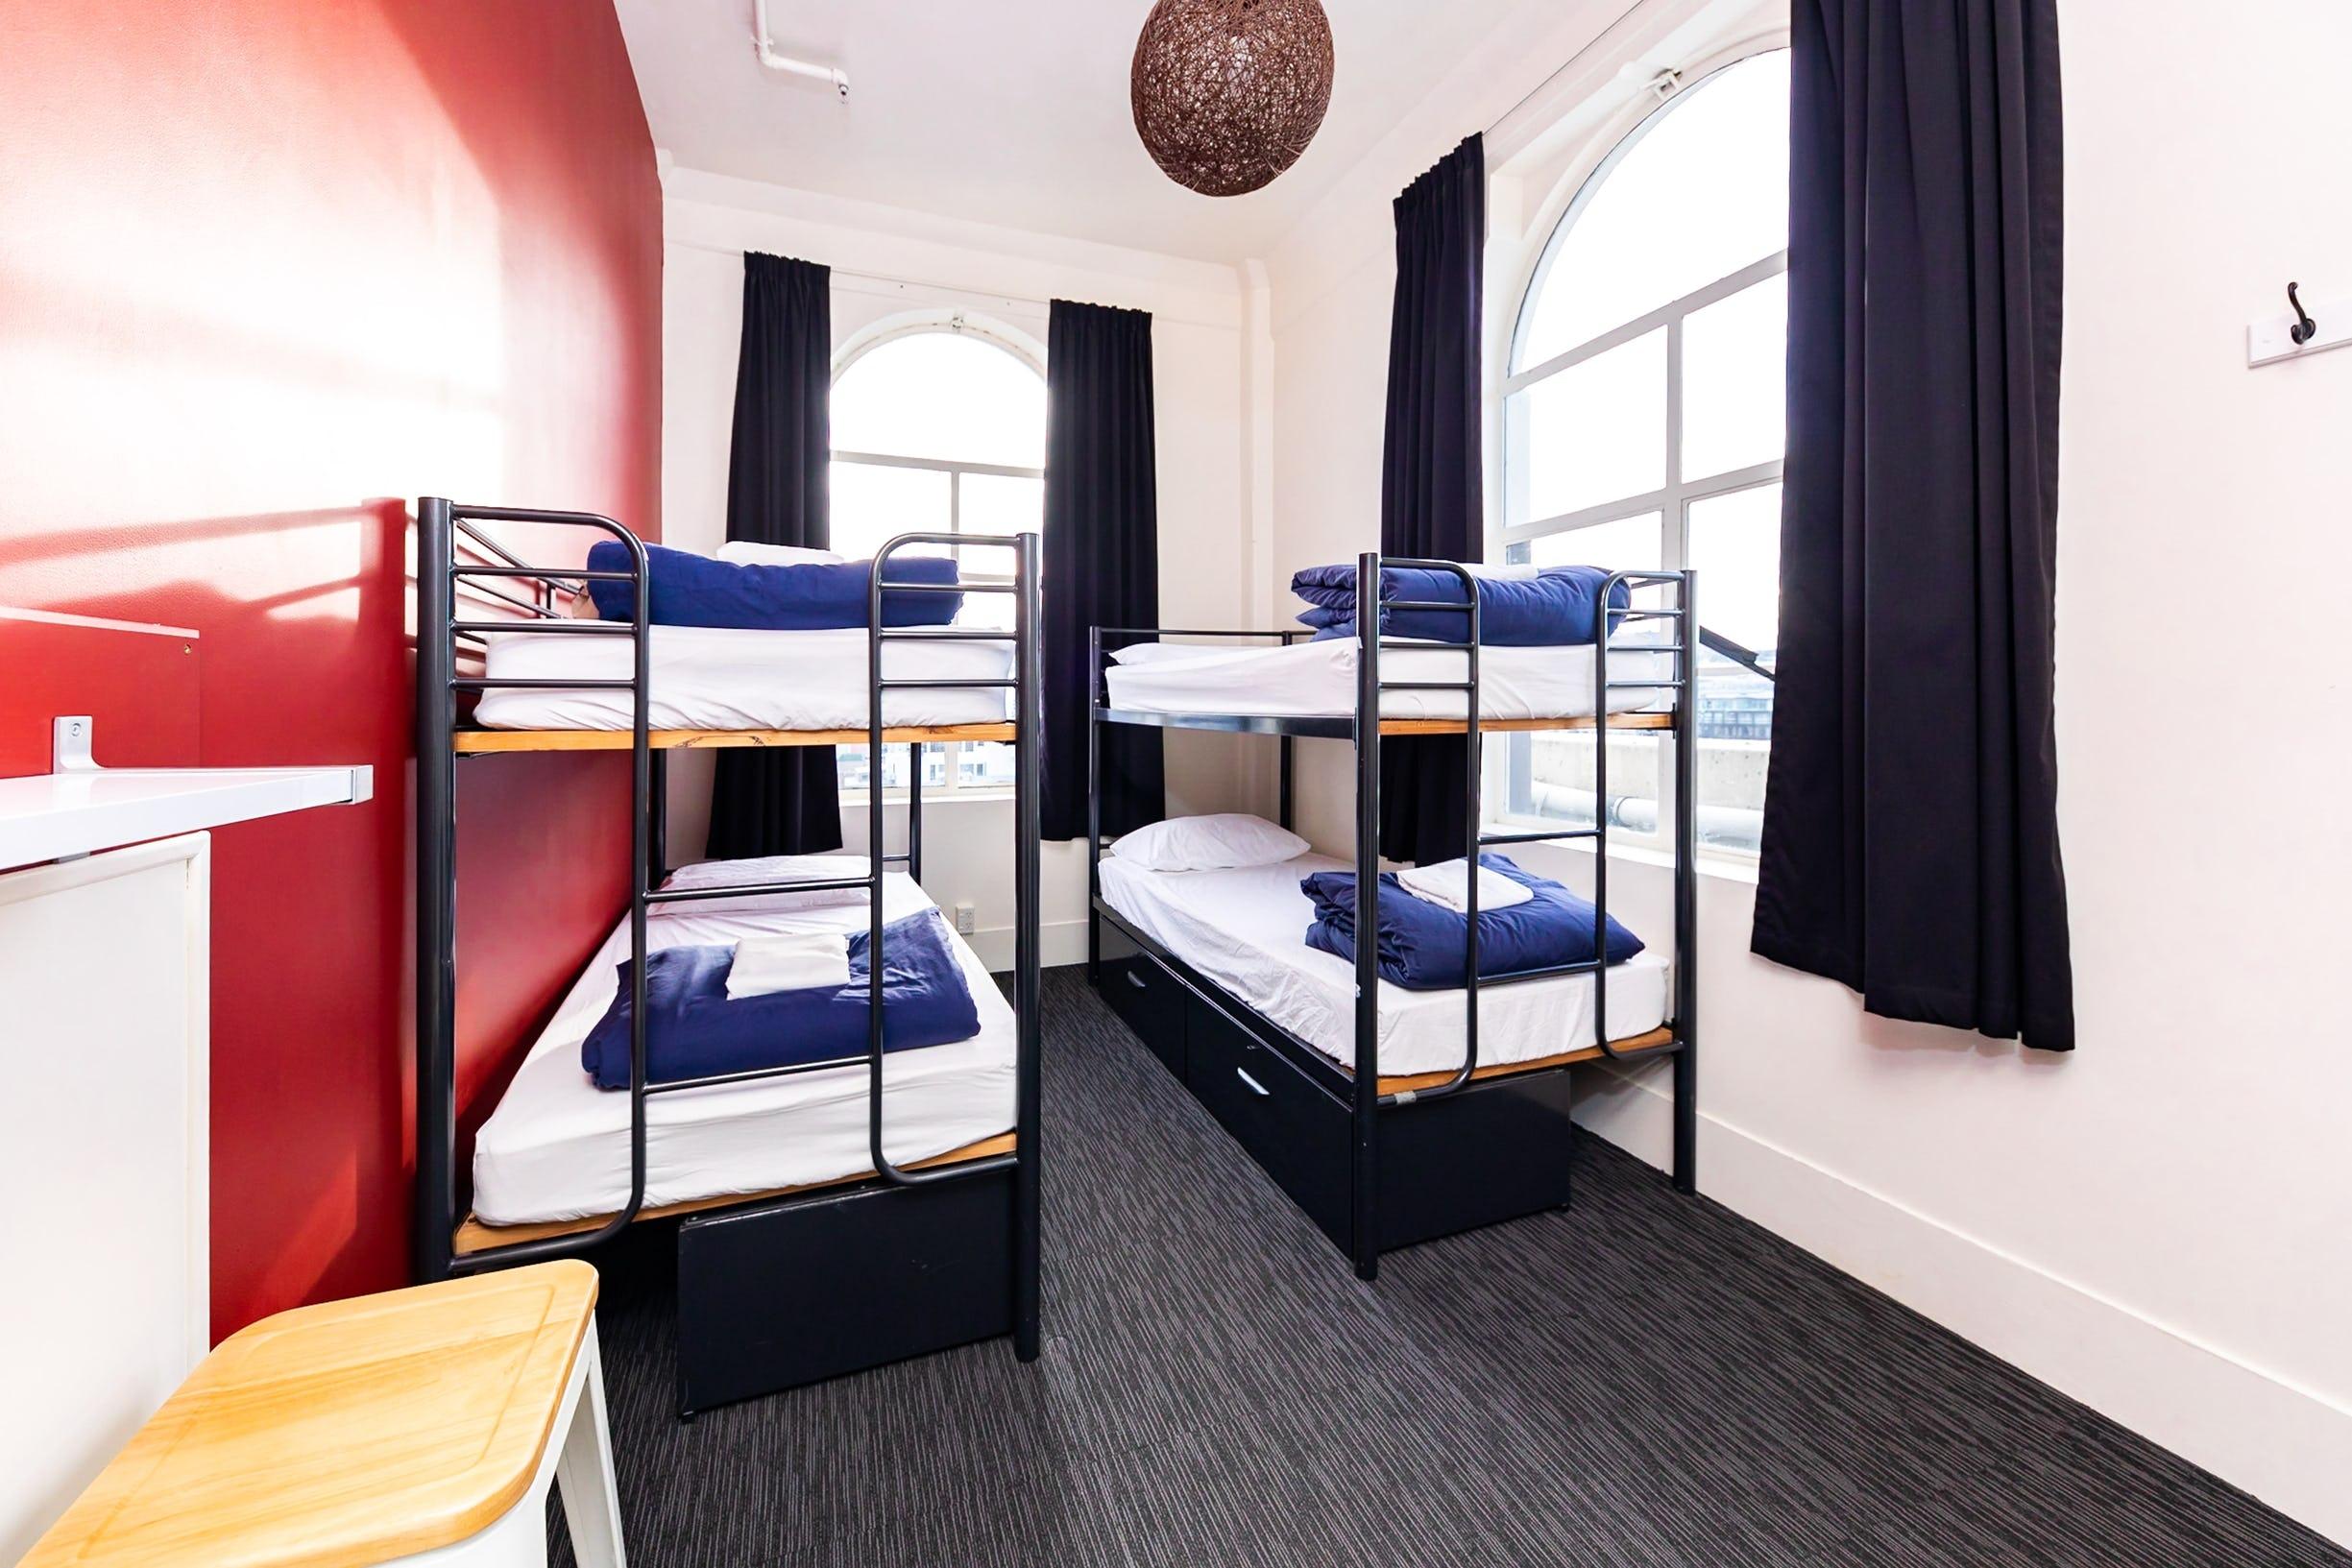 Base惠灵顿背包客旅馆的4床女宿舍